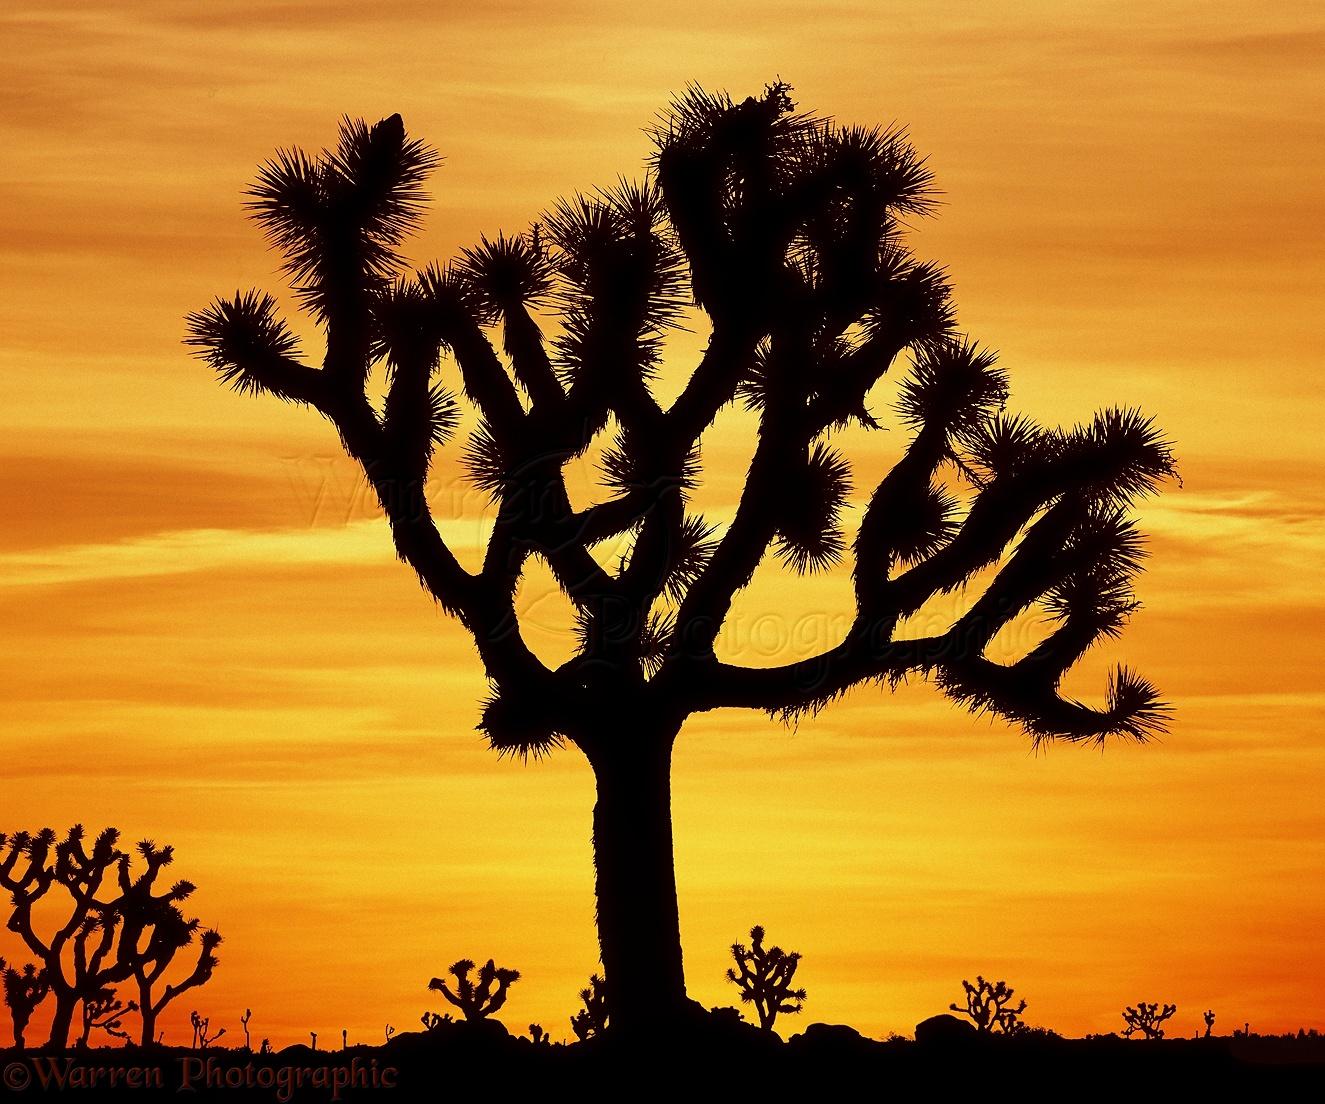 WP04717 Joshua Tree ( Yucca brevifolia ) at sunrise. California, USA.: www.warrenphotographic.co.uk/04717-joshua-tree-at-sunrise